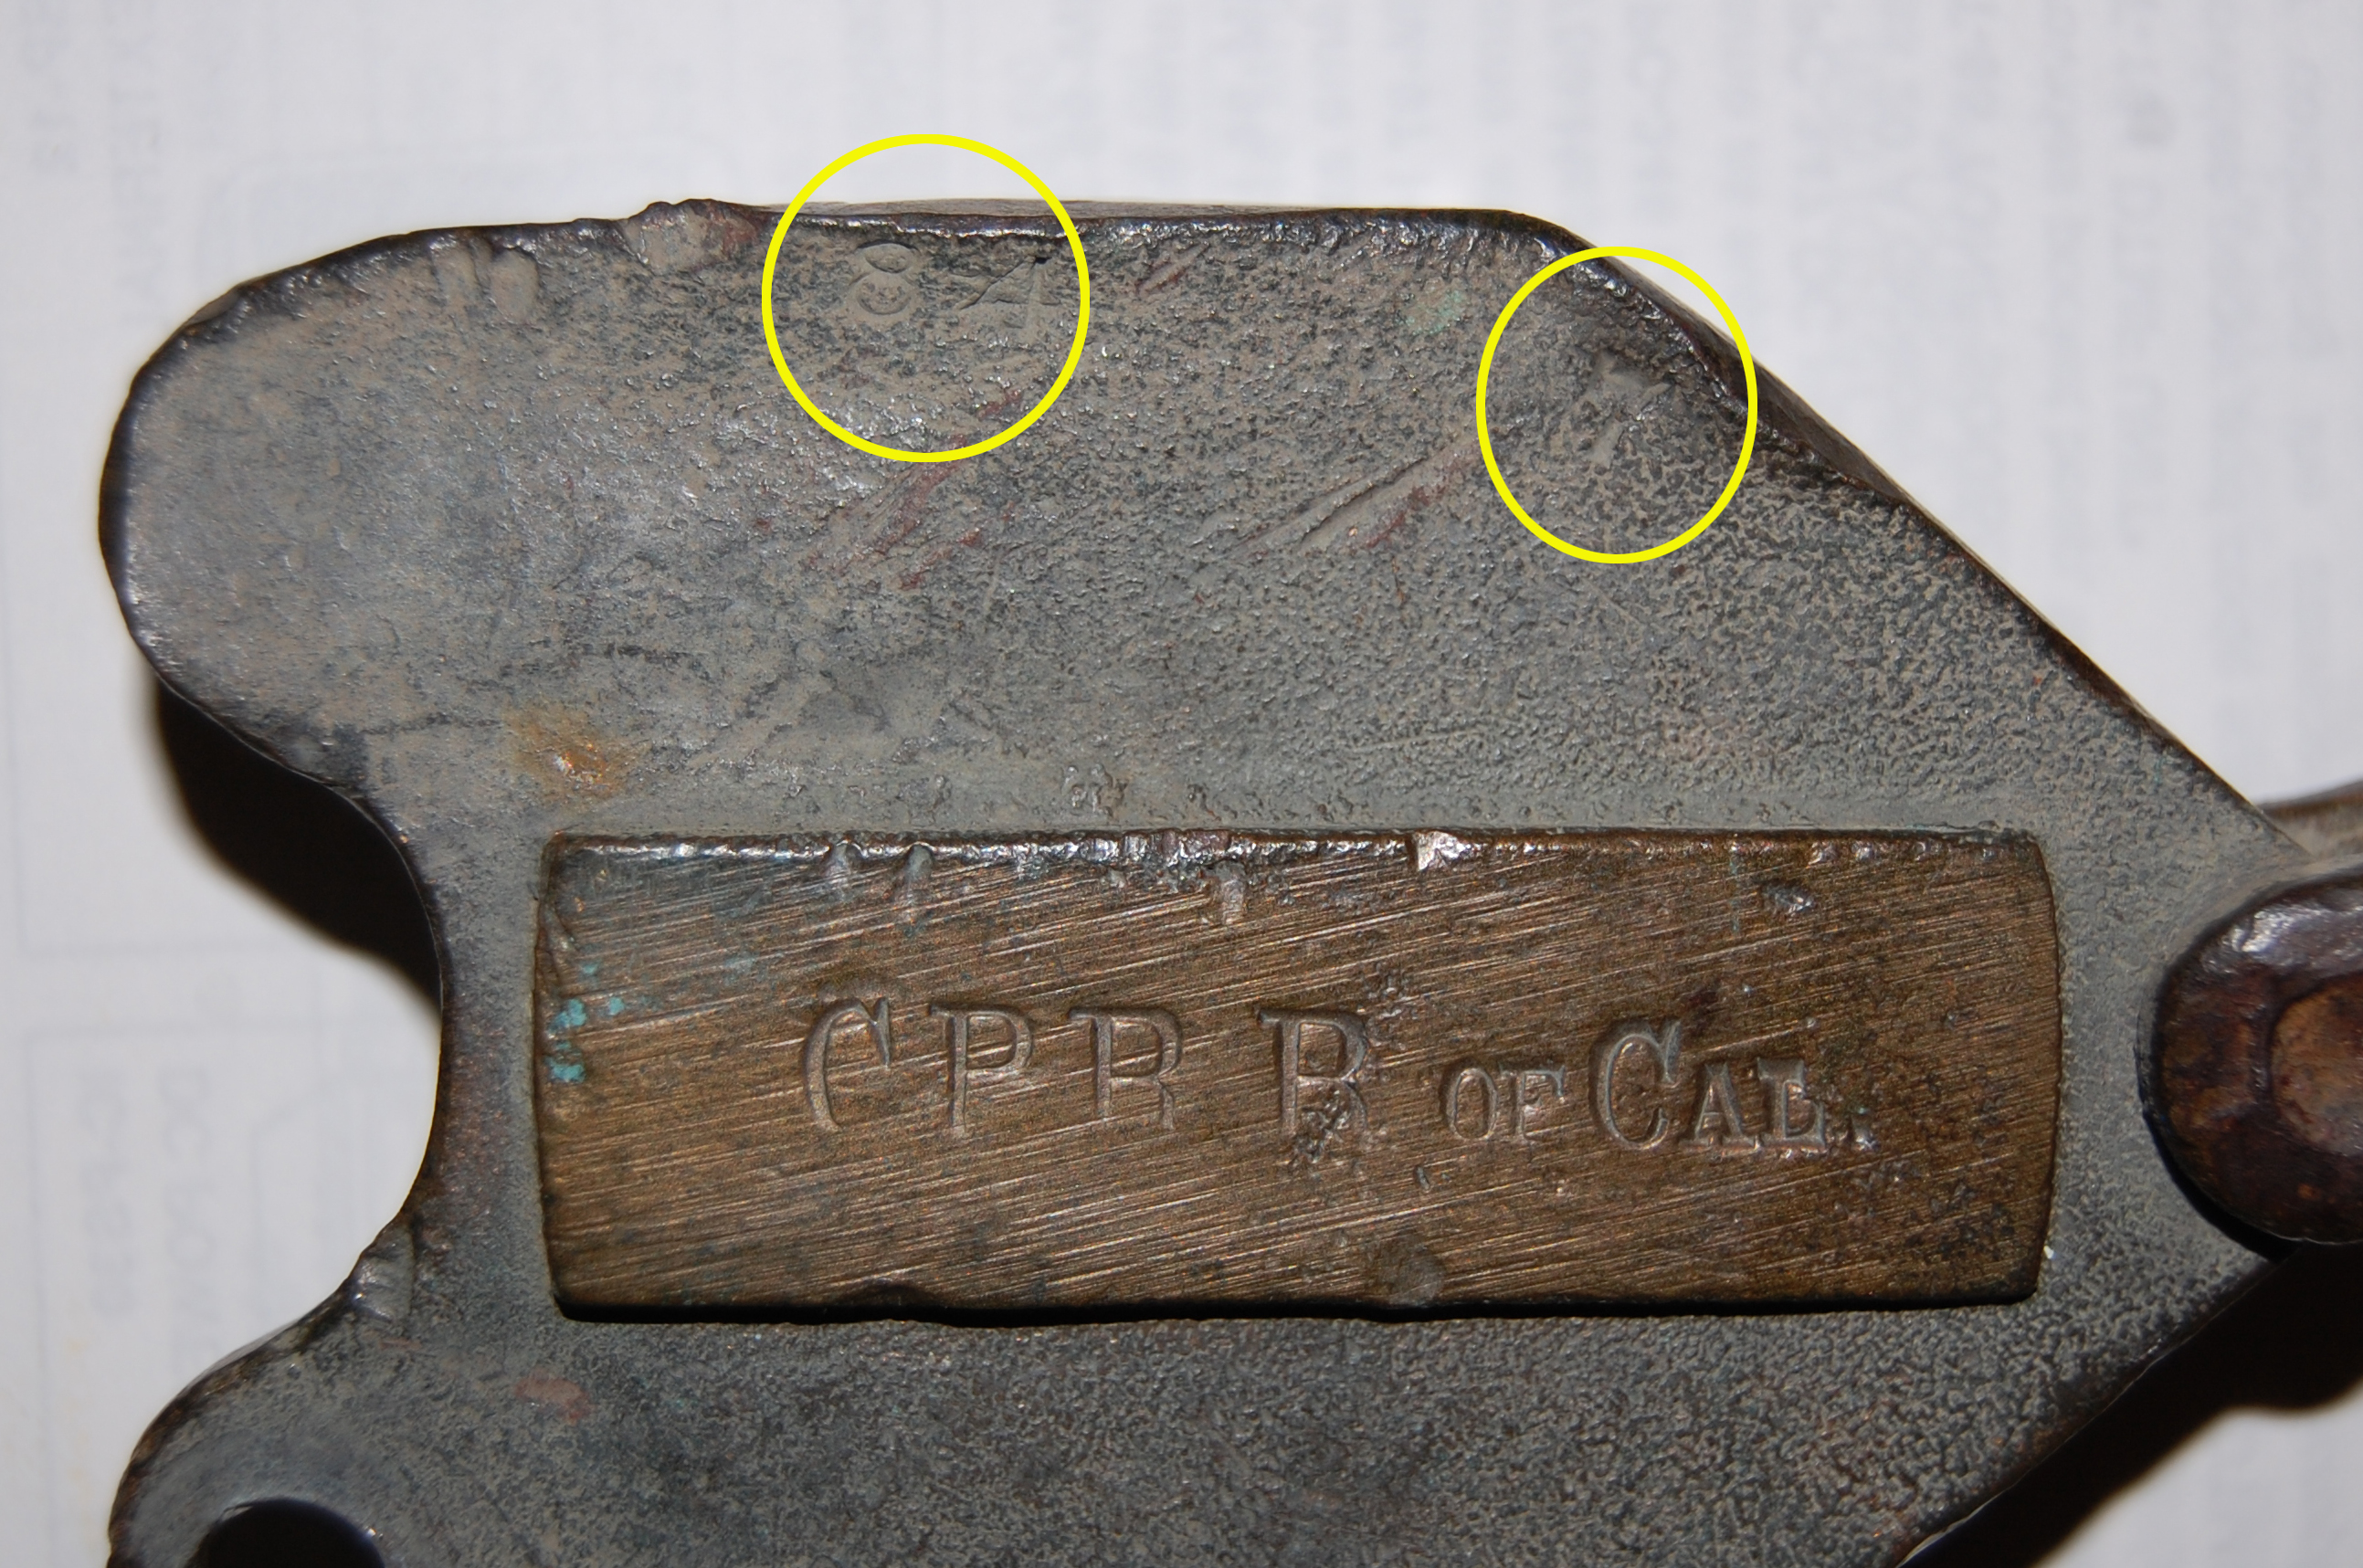 CPRR Lock